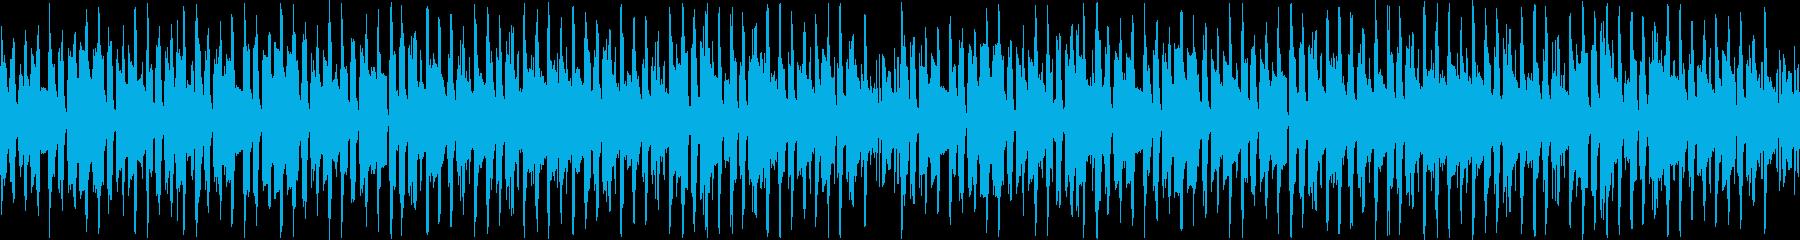 【YouTube】前向きな日常曲・バンドの再生済みの波形